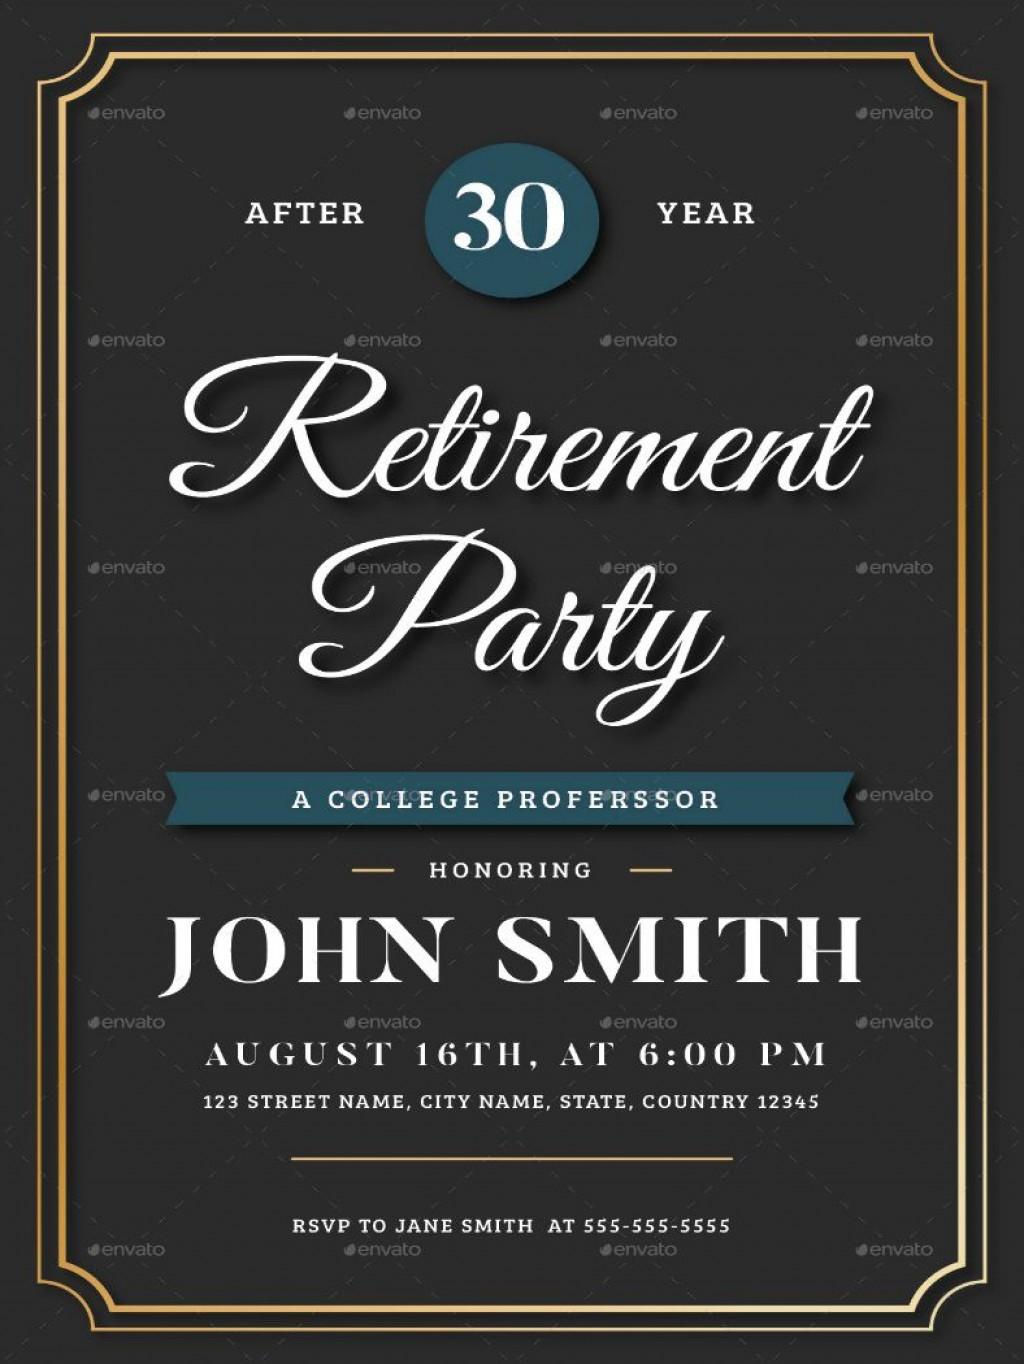 006 Breathtaking Free Retirement Invitation Template Sample  Templates Microsoft Word Party FlyerLarge